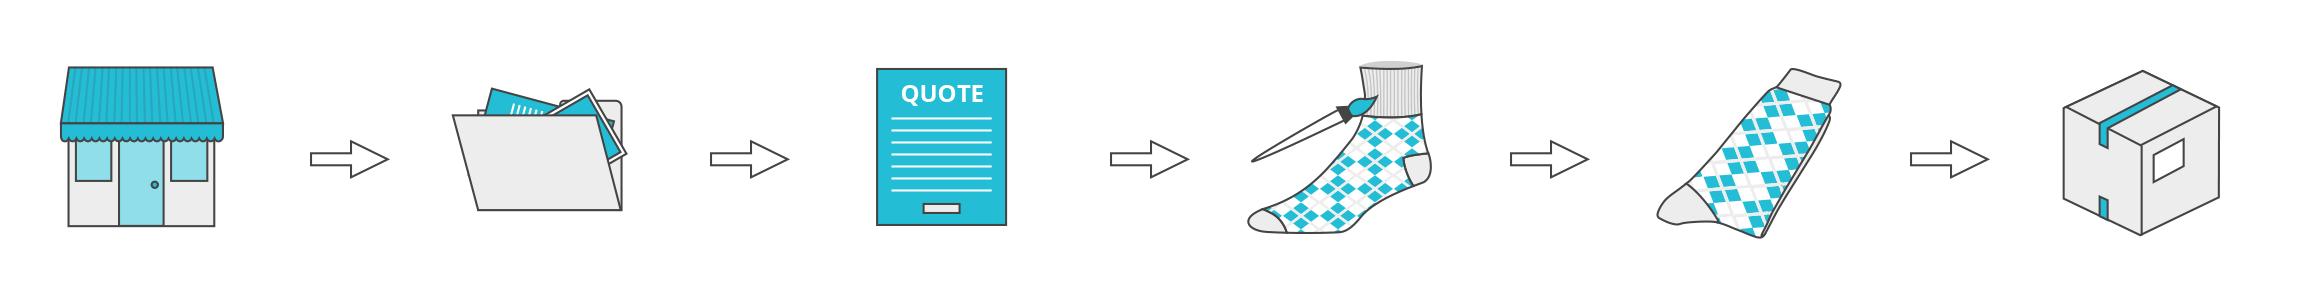 Custom socks design process